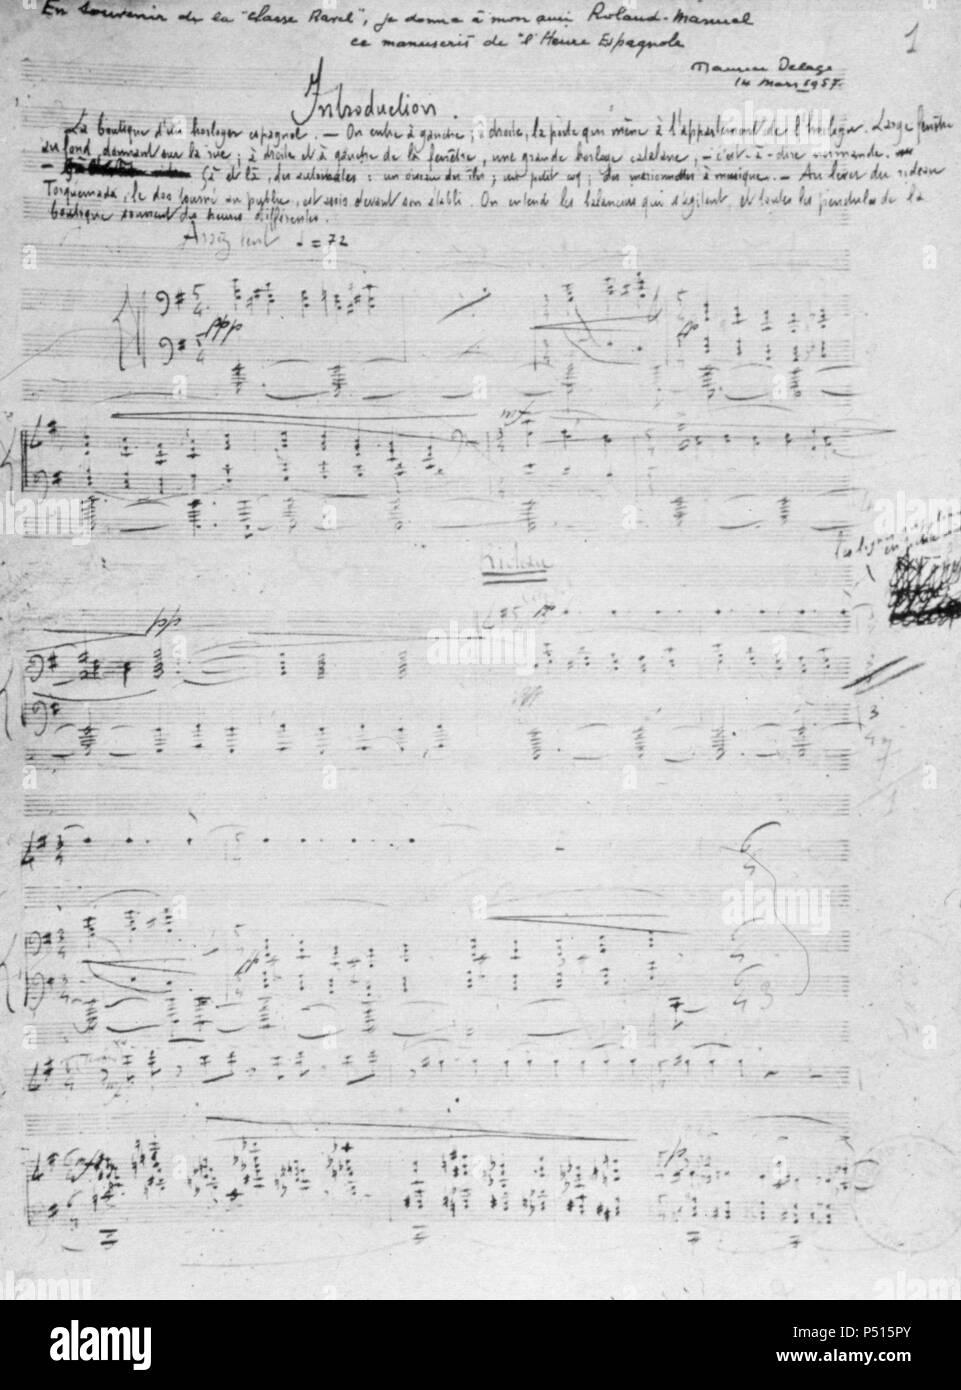 Score for Ravel's 'L'heure Espagnole'. - Stock Image